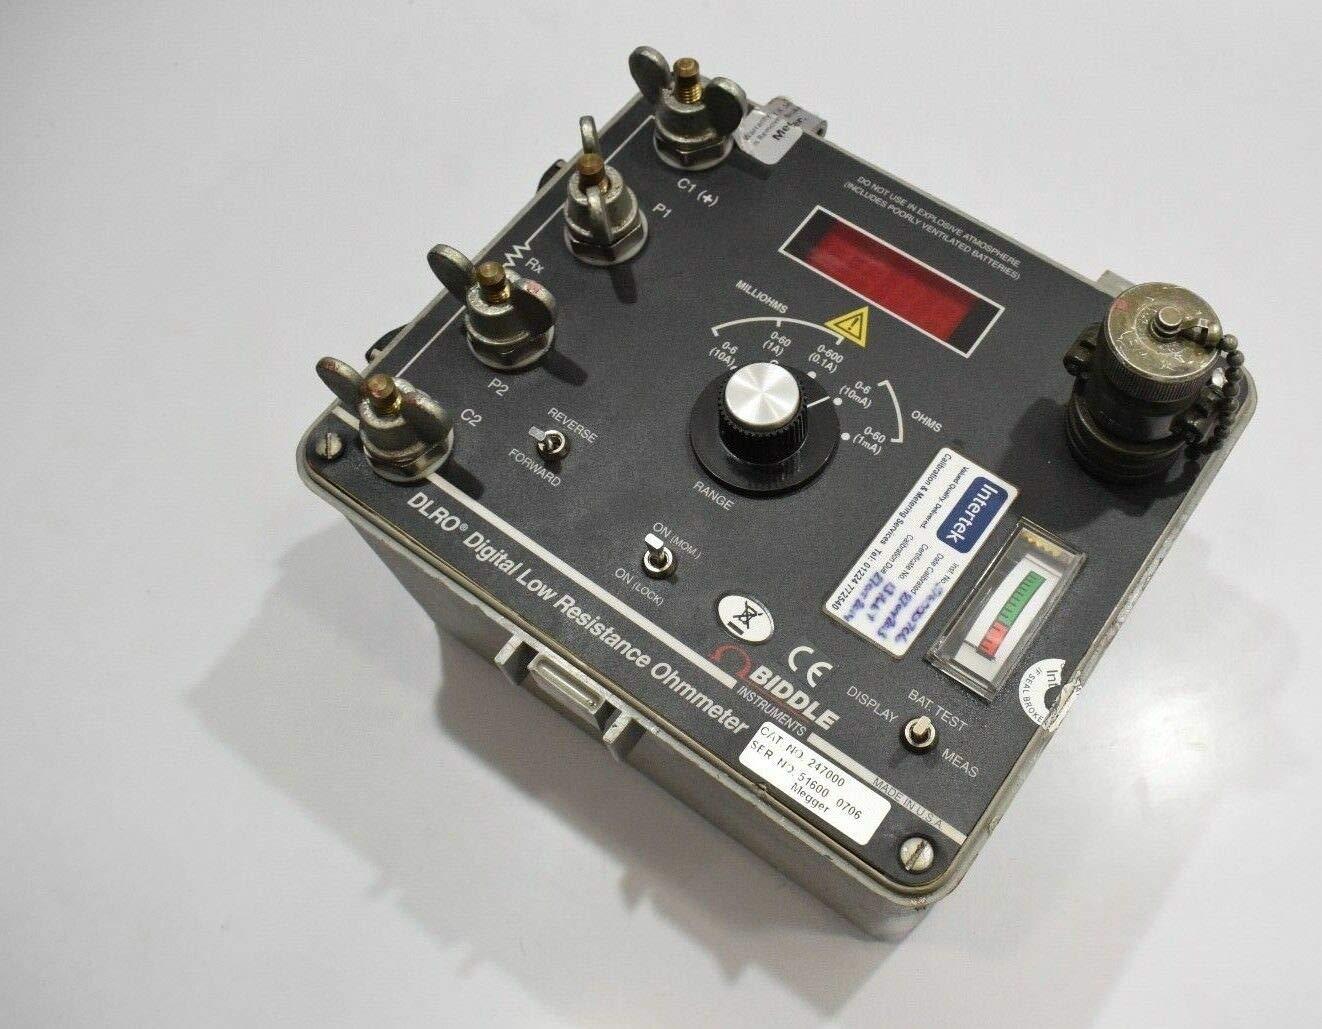 Biddle 247000 Dlro Digital Low Resistance Ohmmeter Amazon Com Industrial Scientific